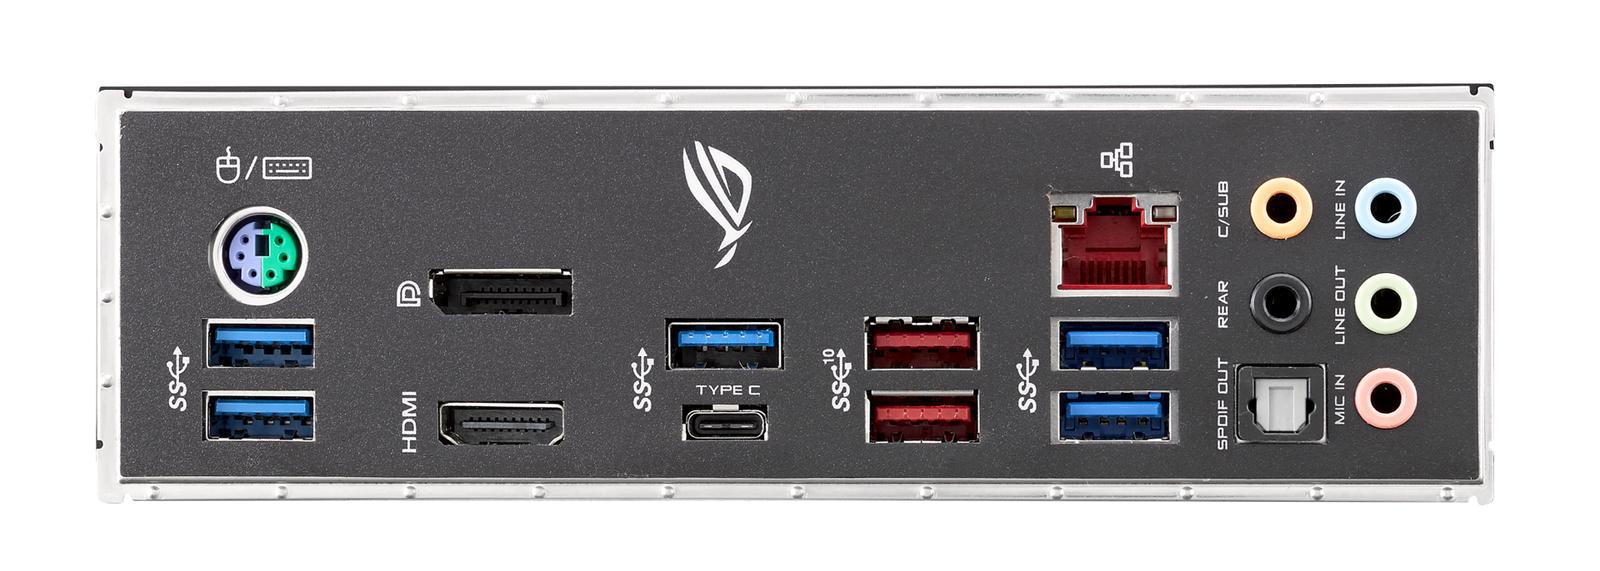 Asus ROG STRIX X470-F Gaming ATX AM4 Motherboard